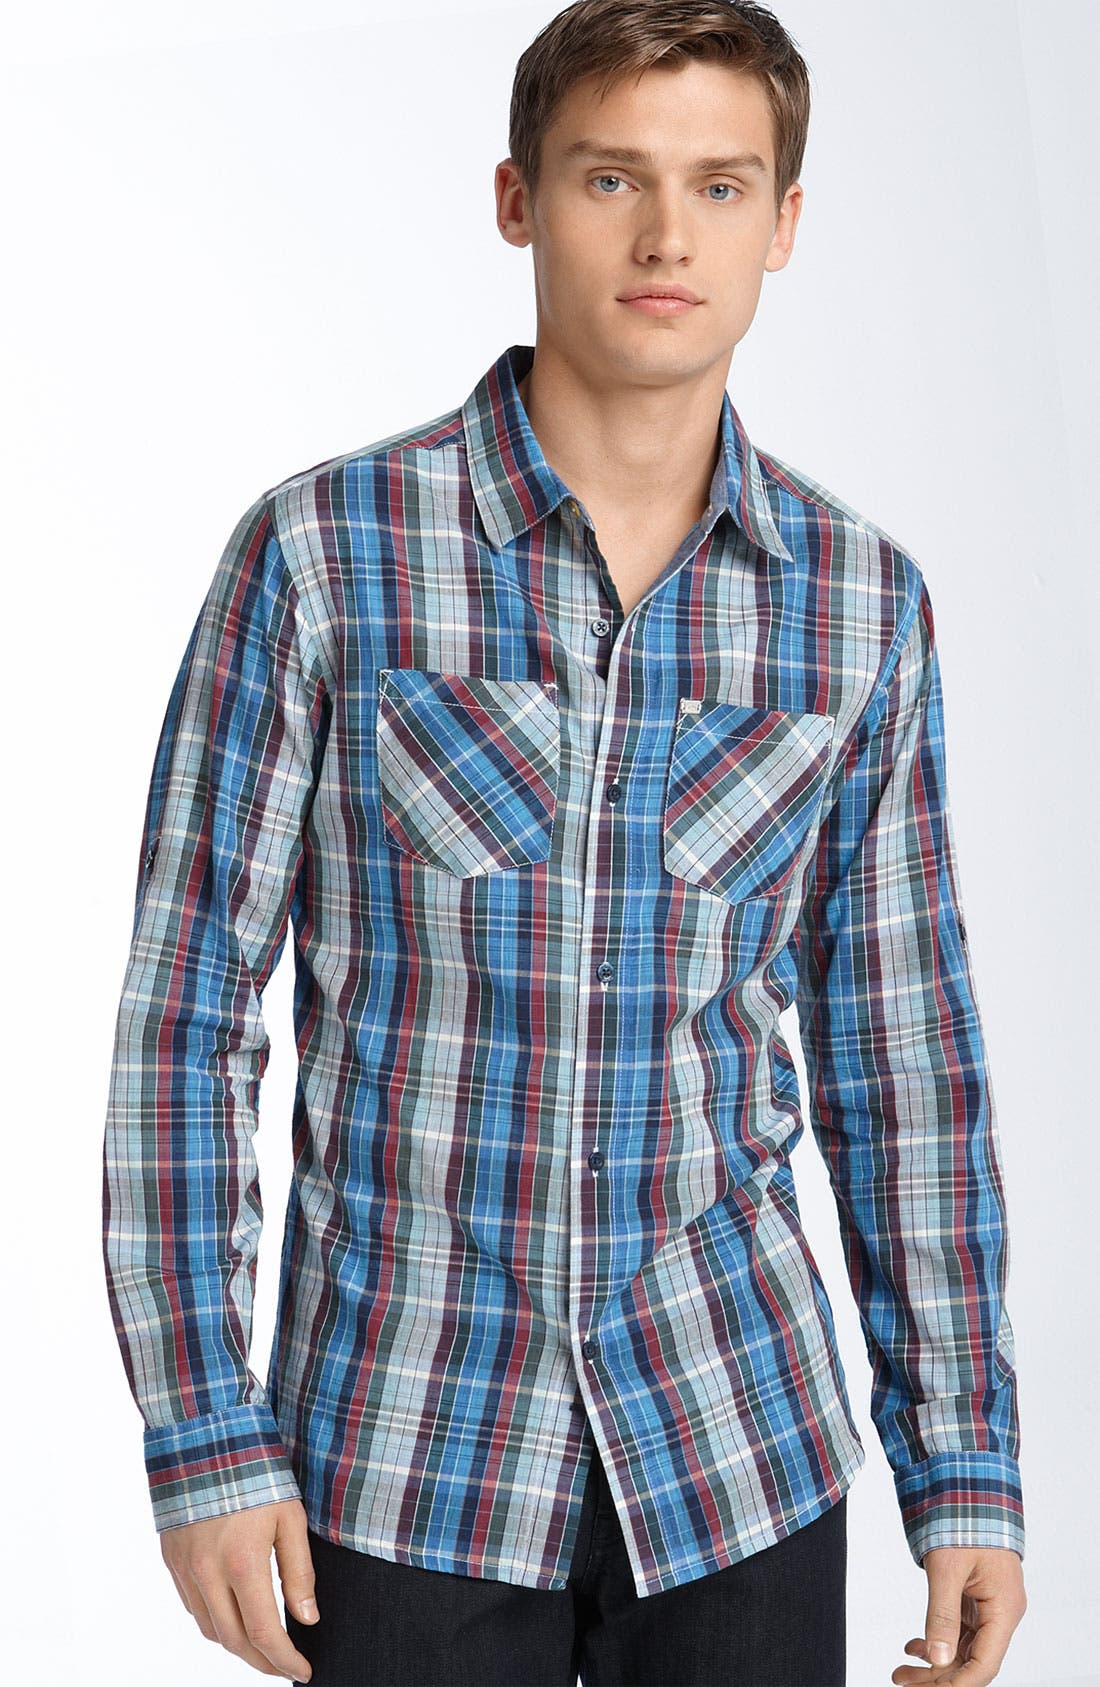 'Oleary' Plaid Shirt,                             Main thumbnail 1, color,                             415